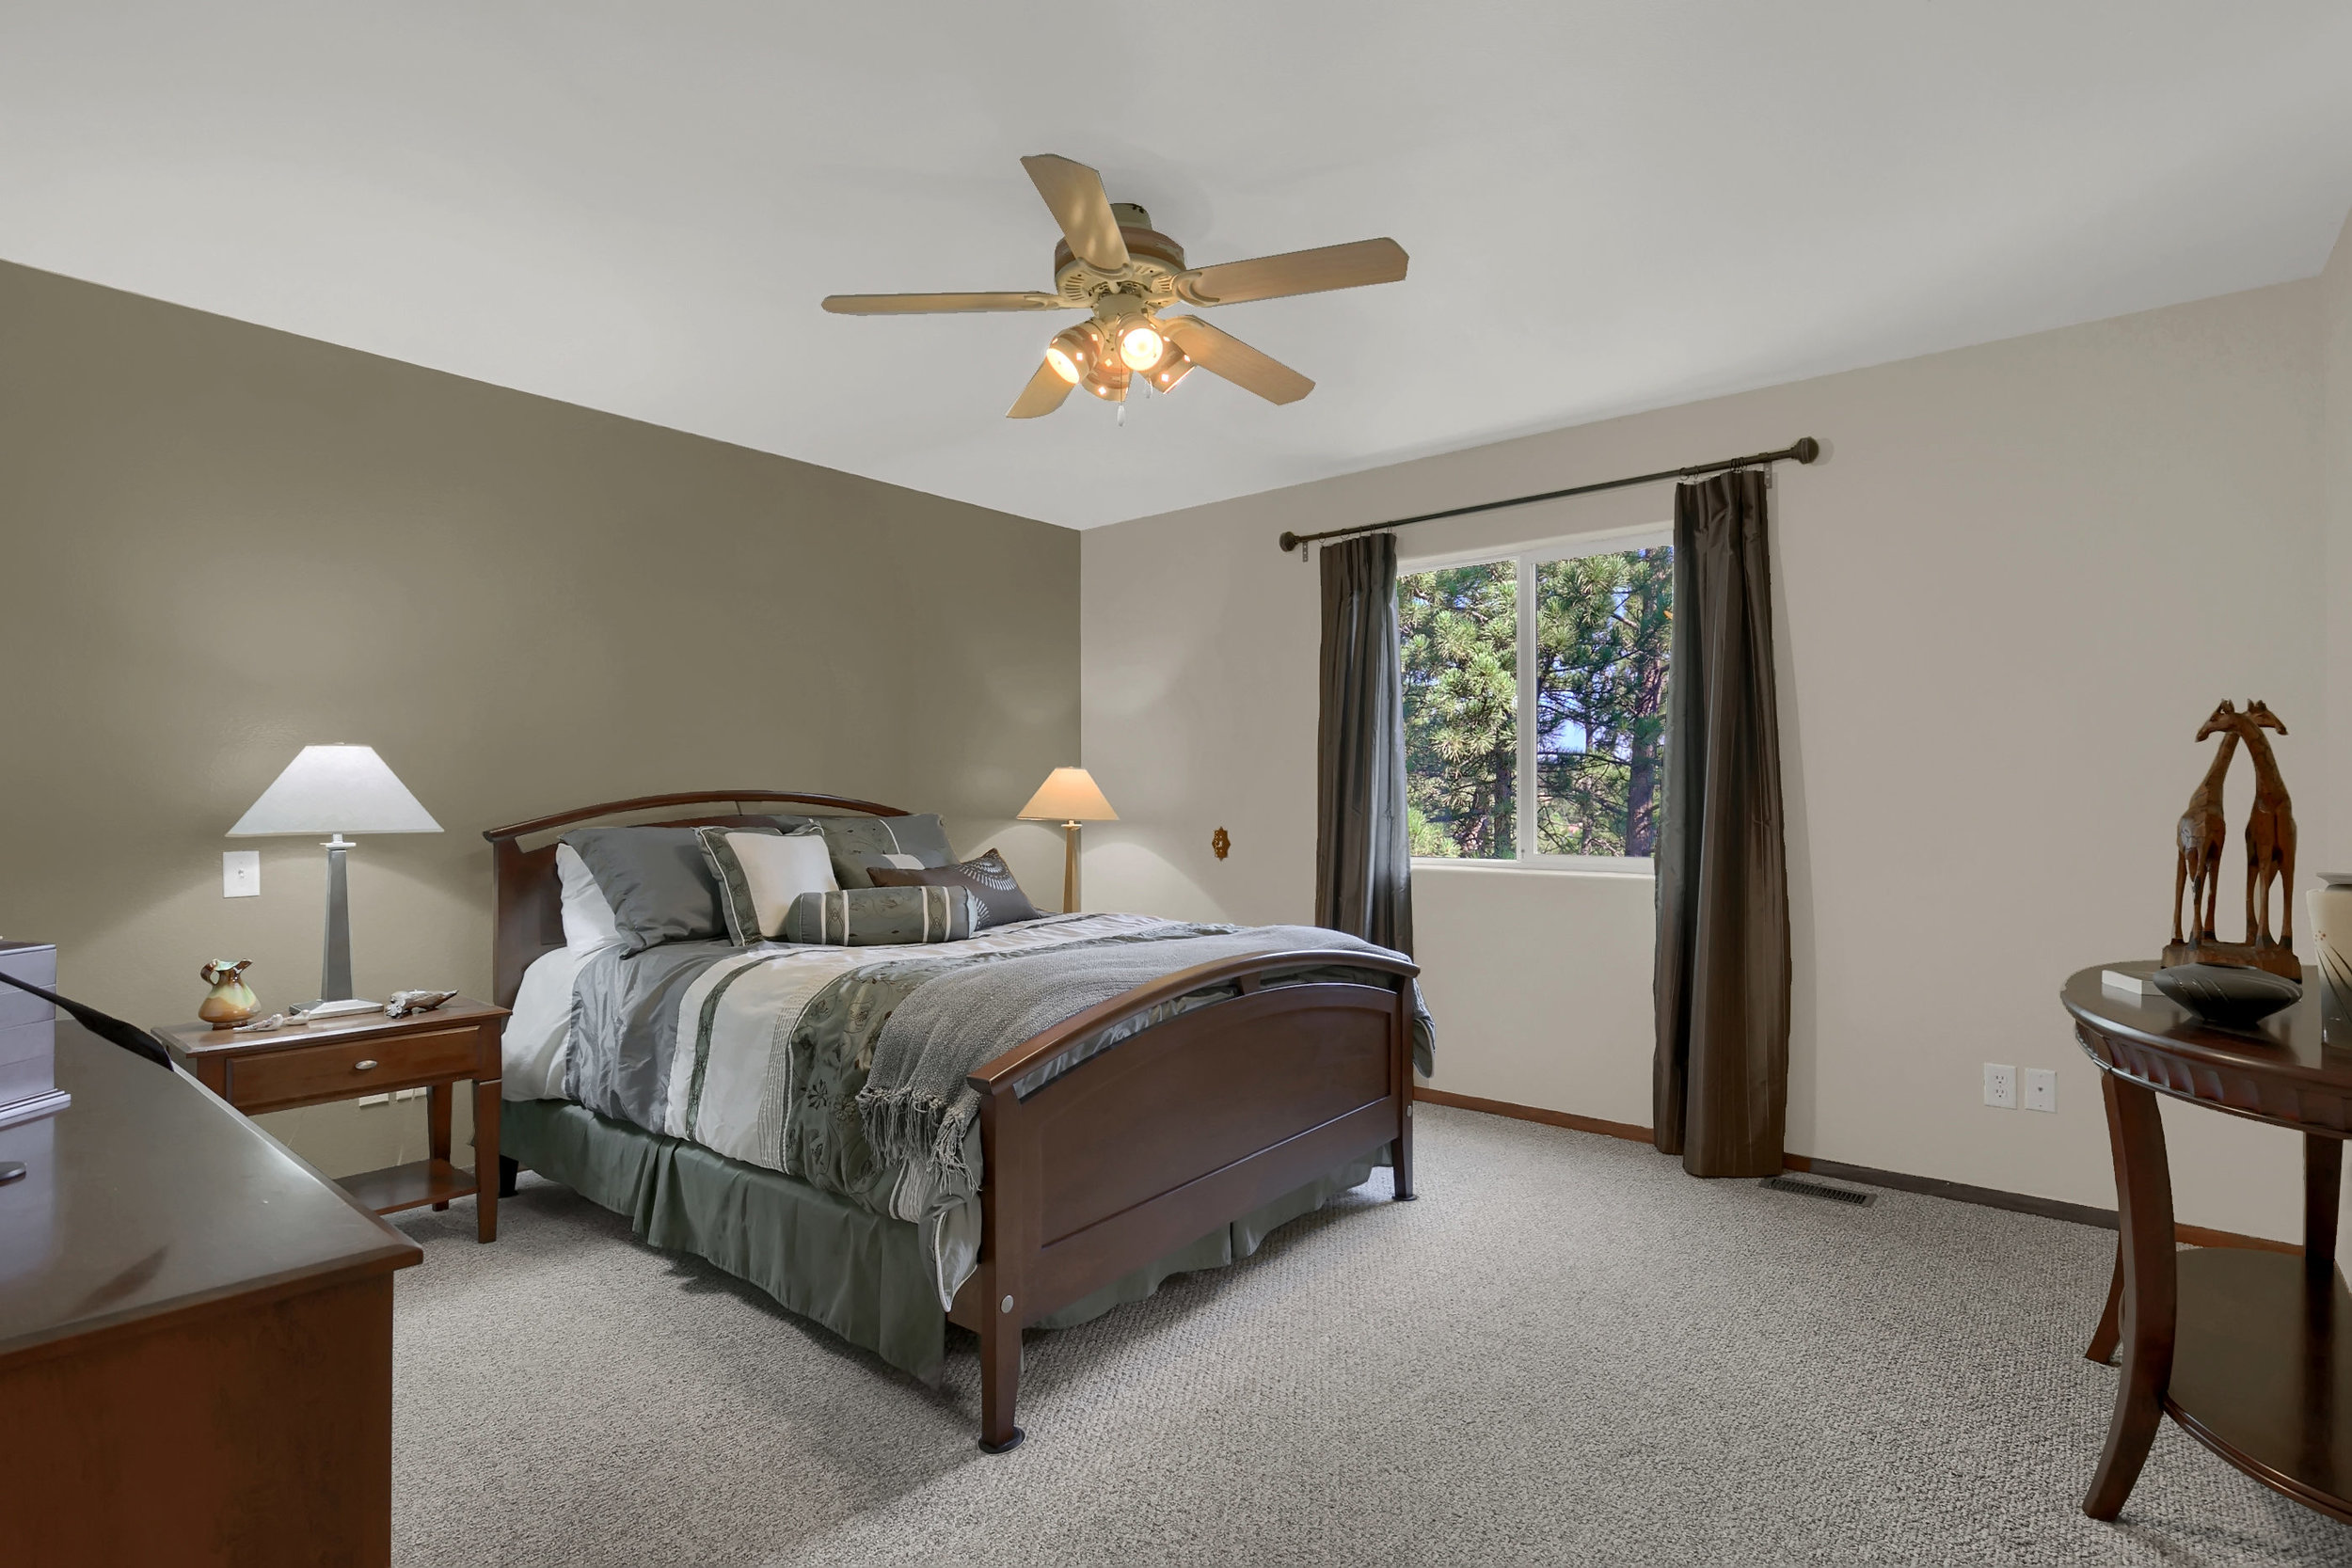 1605 Vickers Drive Colorado-print-018-004-Bedroom-2798x1866-300dpi.jpg